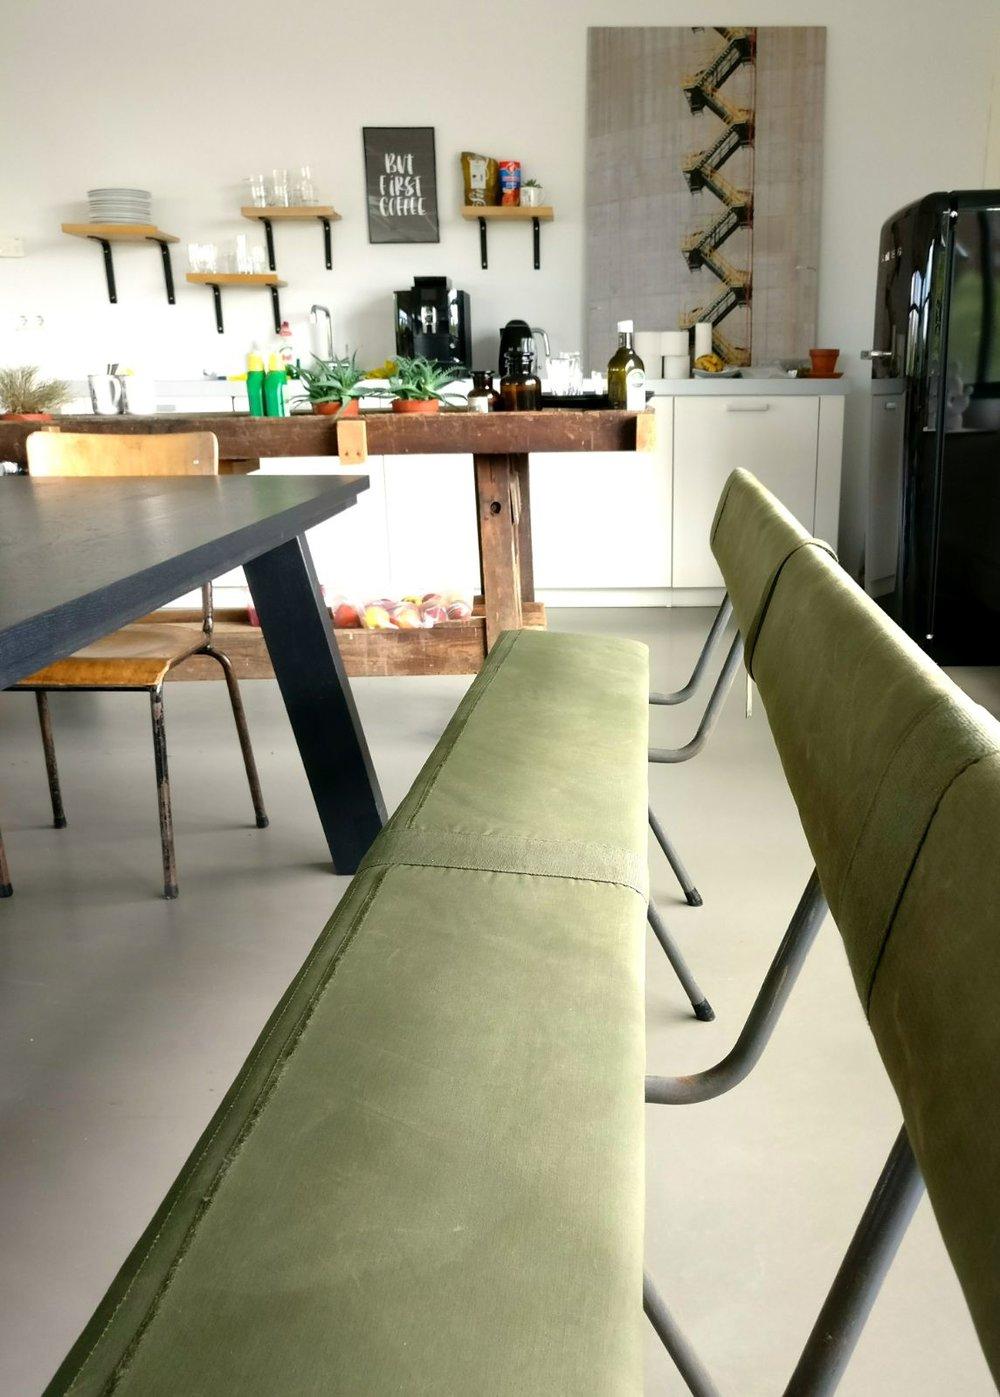 moderne kantoorruimte licht keuken industrieel legerbank.jpg